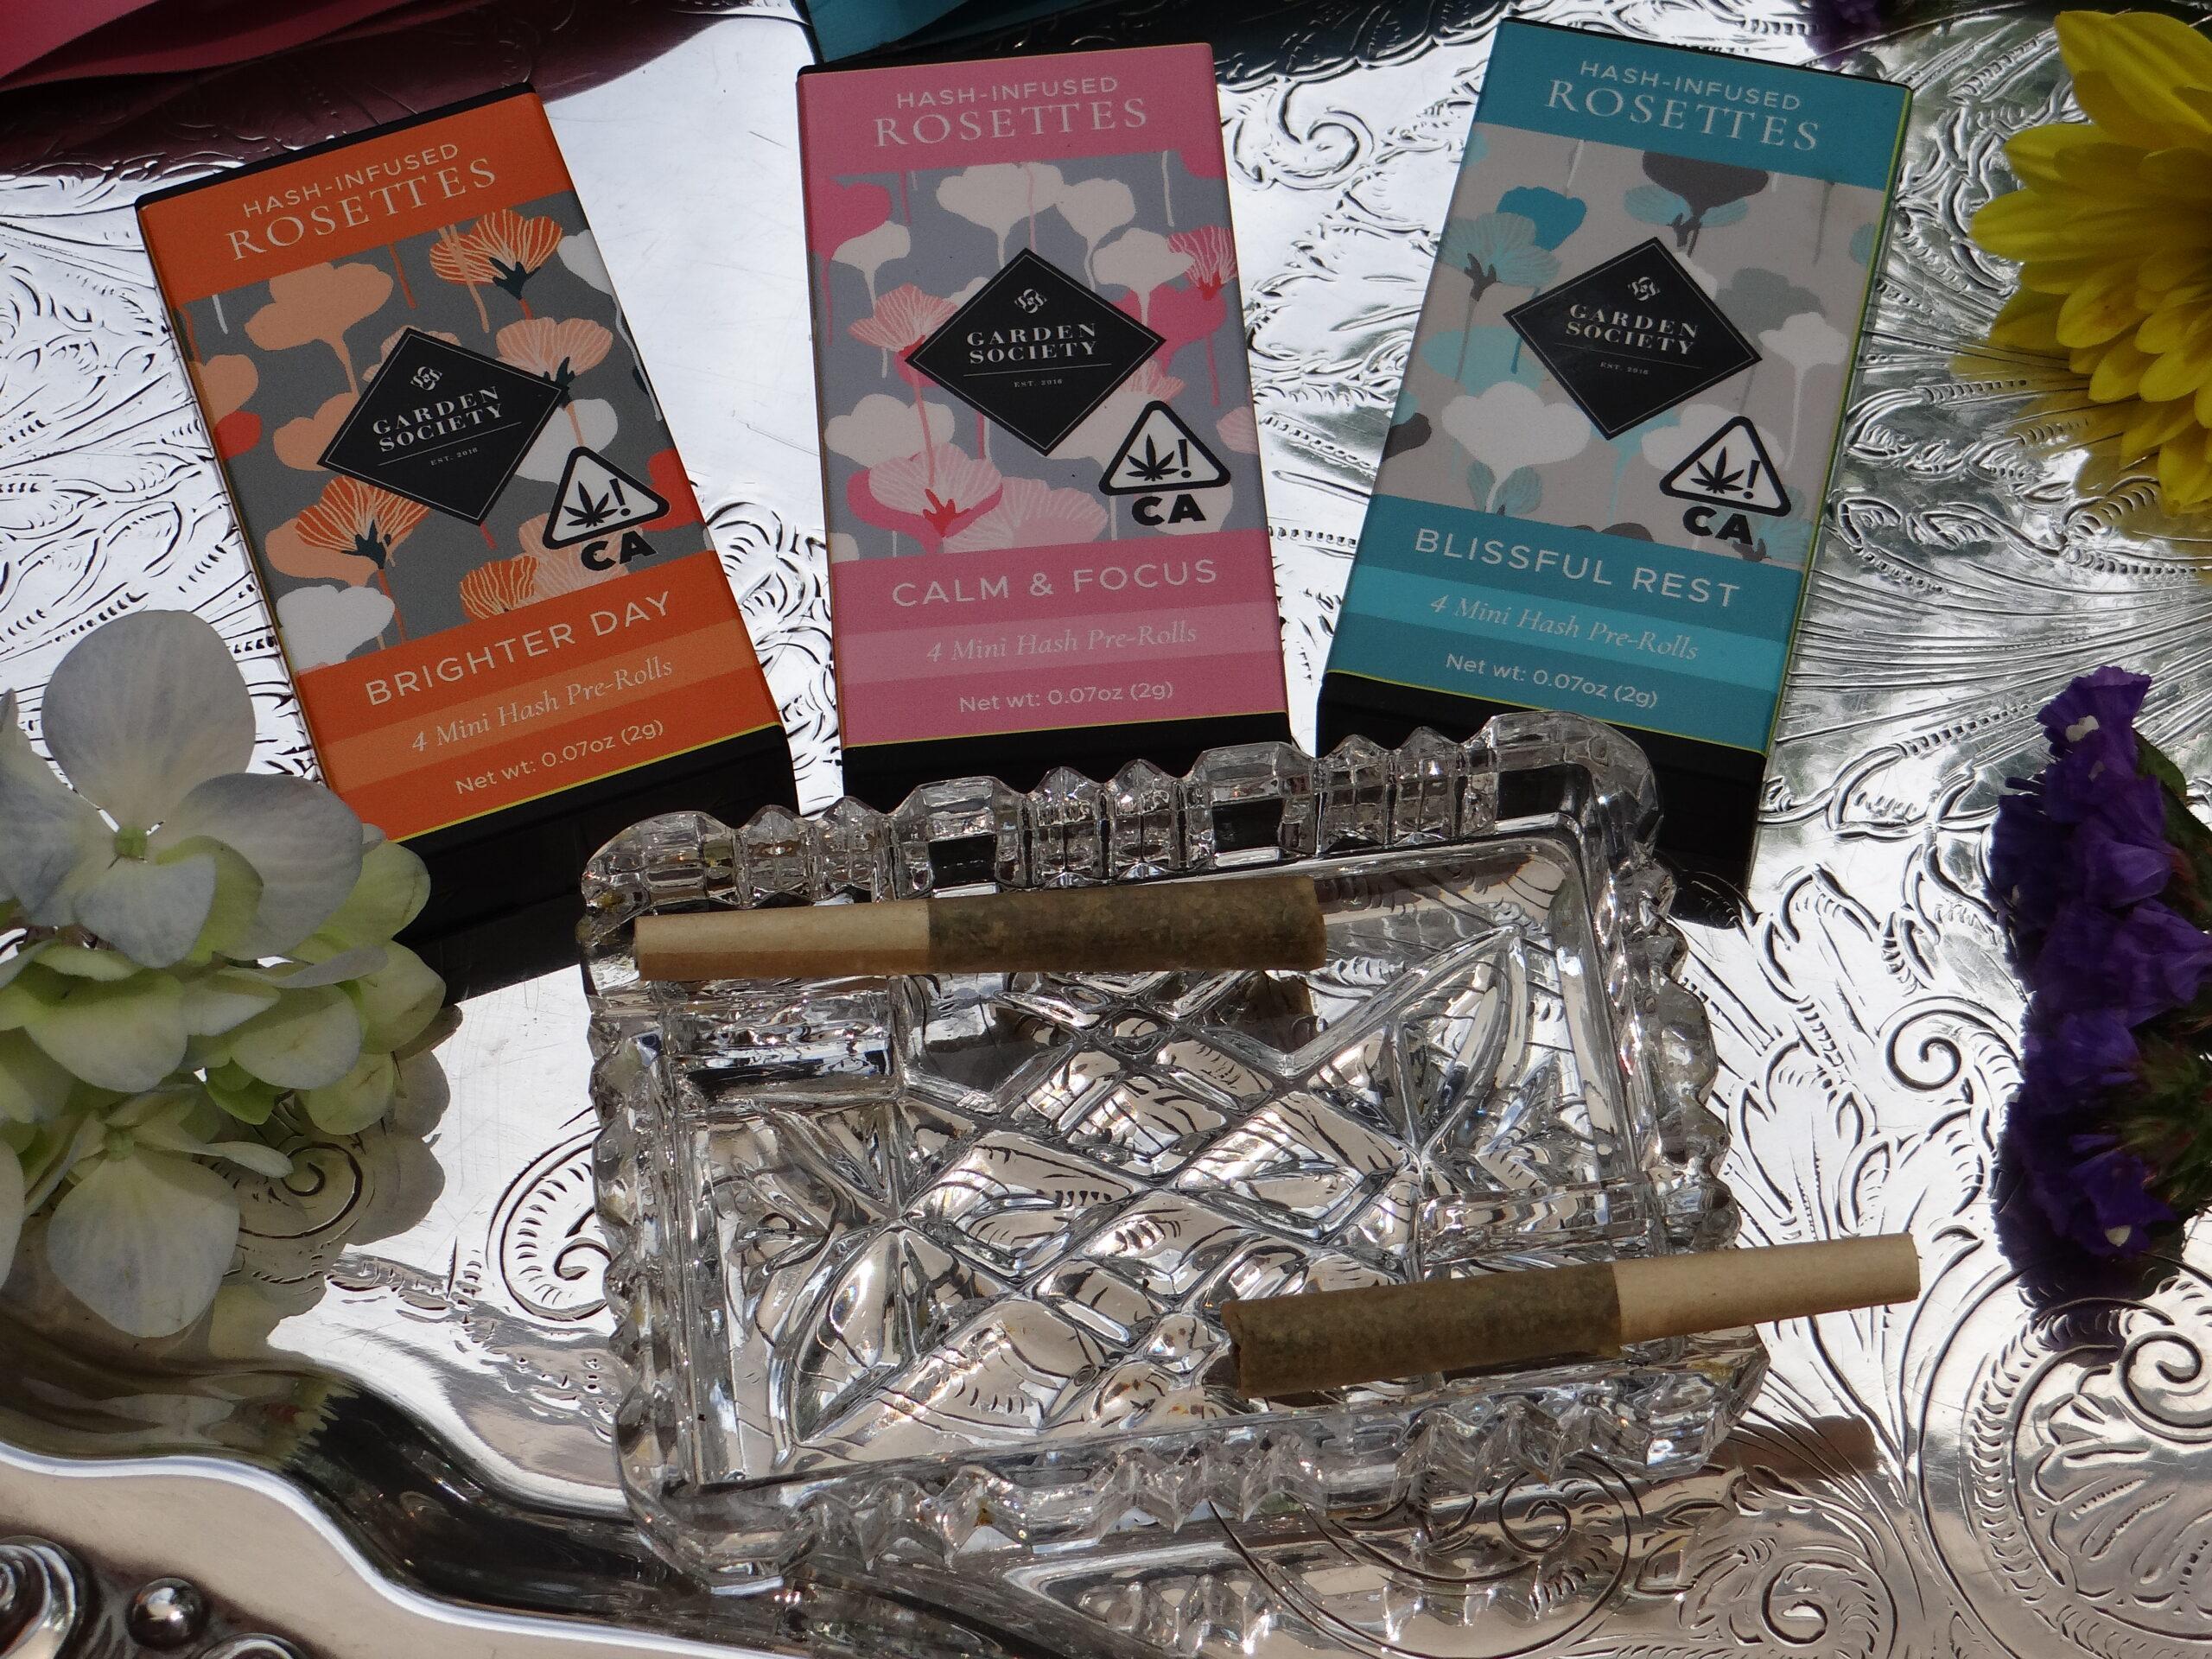 Garden Society Cannabis hash prerolls rosettes